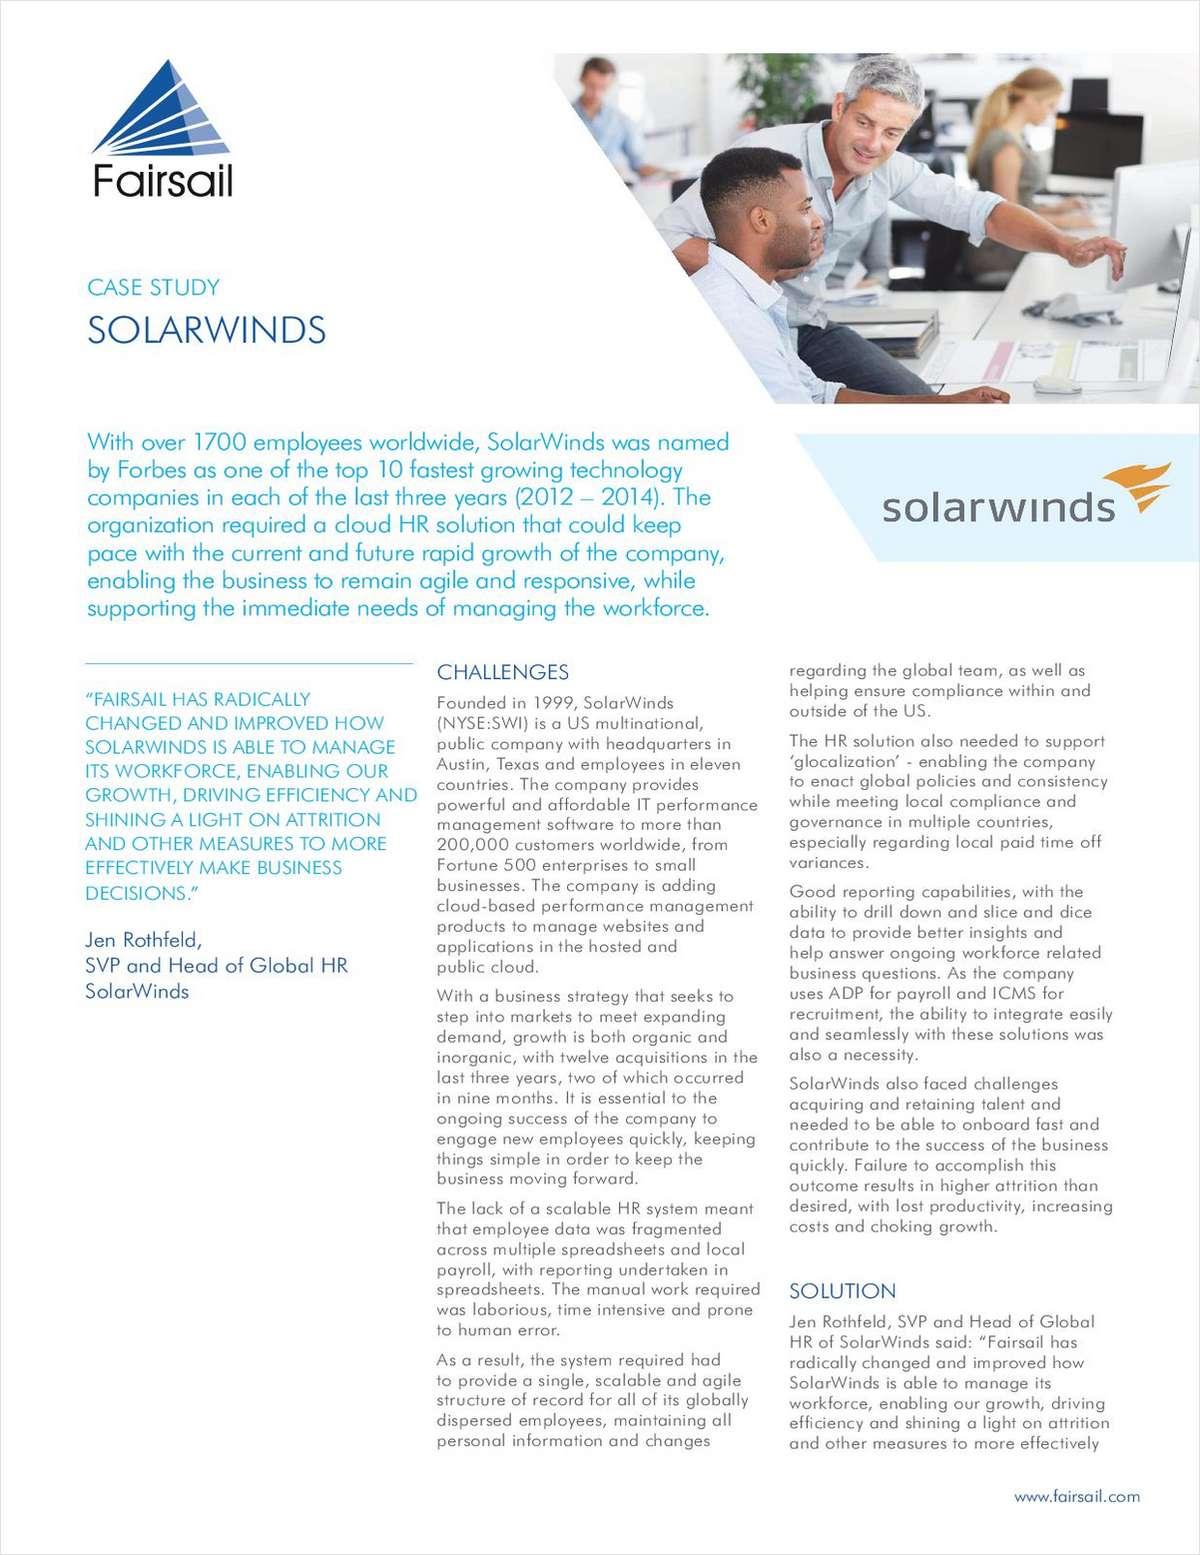 Fairsail Case Study: SolarWinds